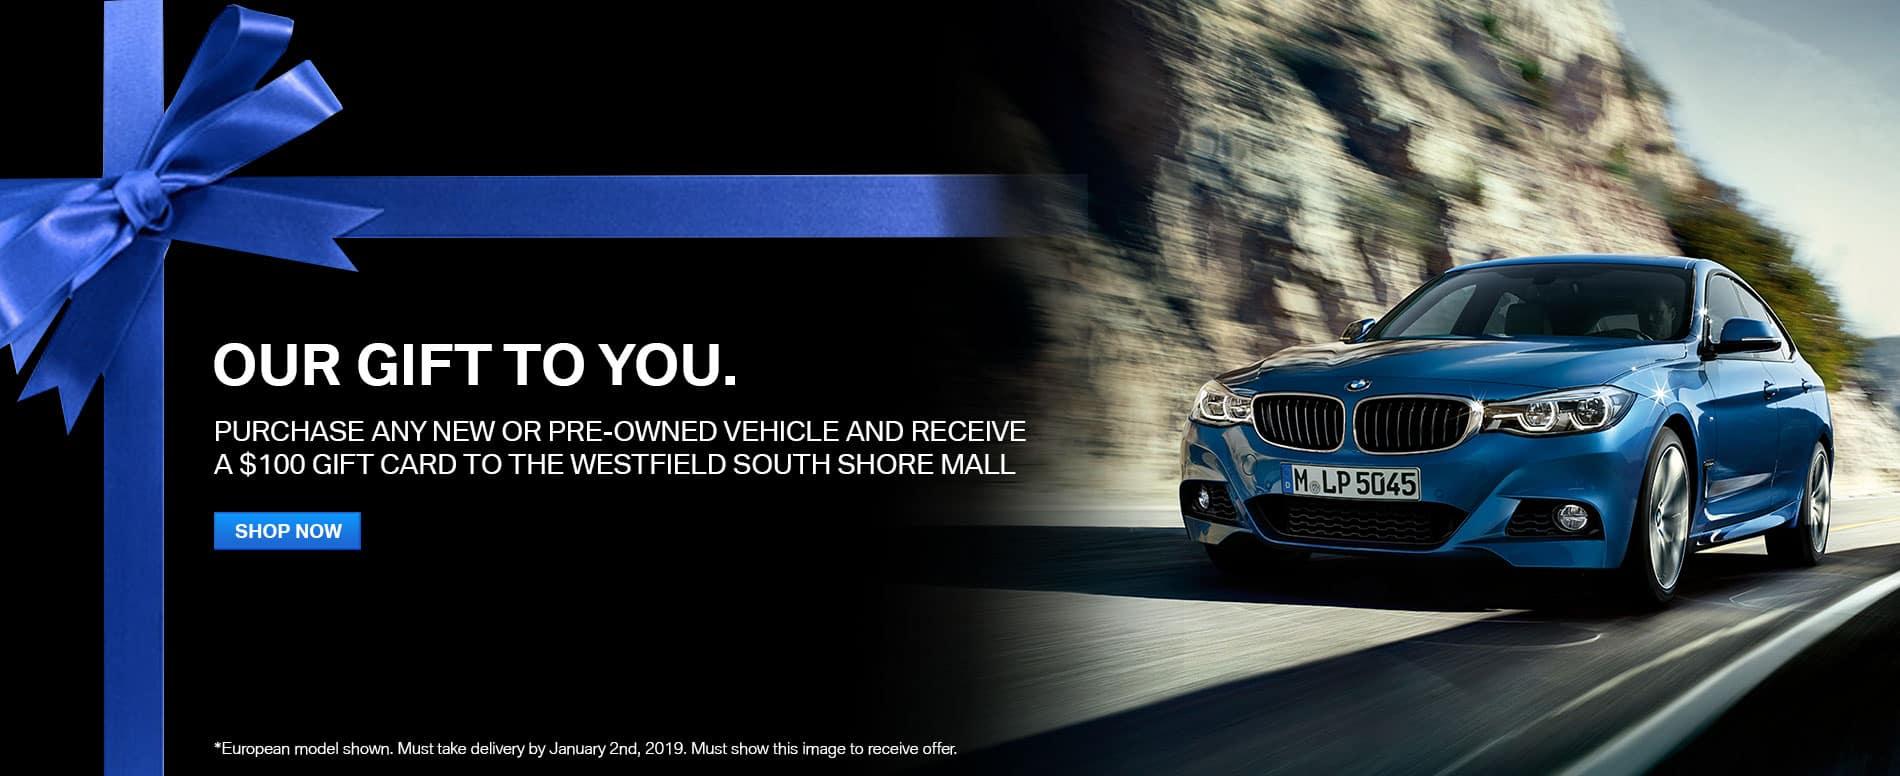 Westfield Mall Offer